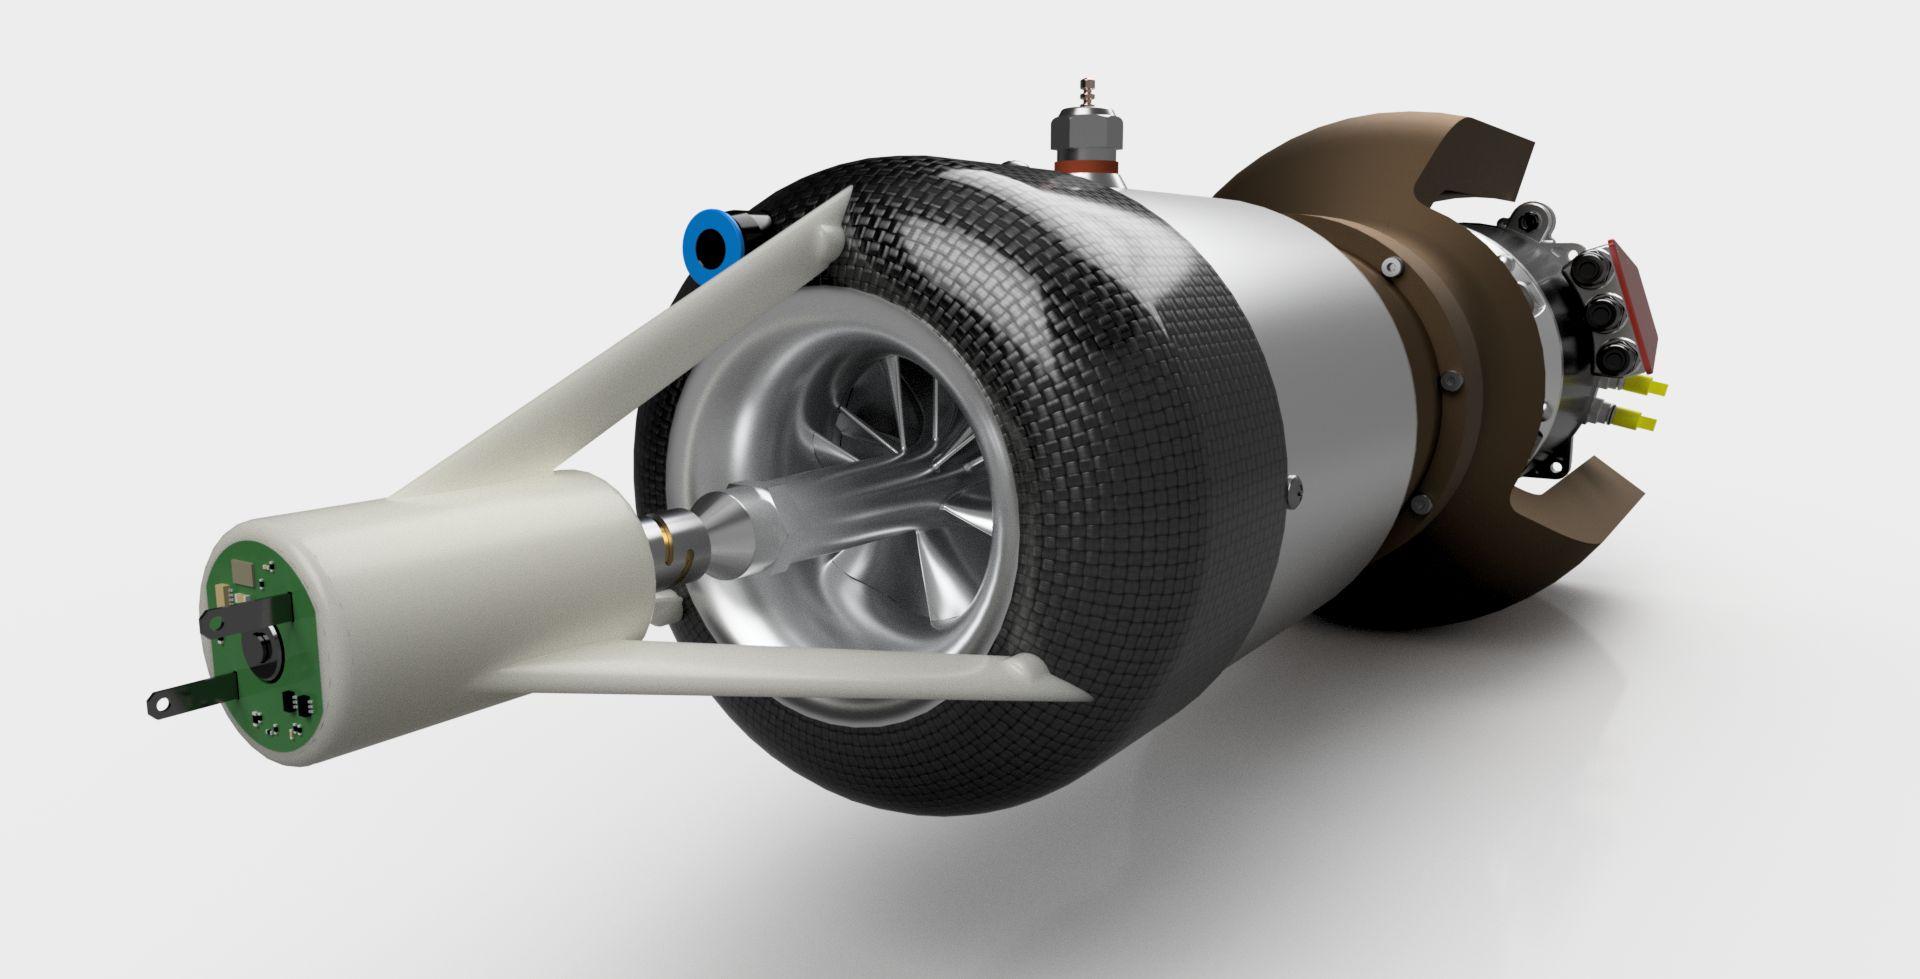 Fus-ray-trace-gas-turbine-generator-01a-3500-3500